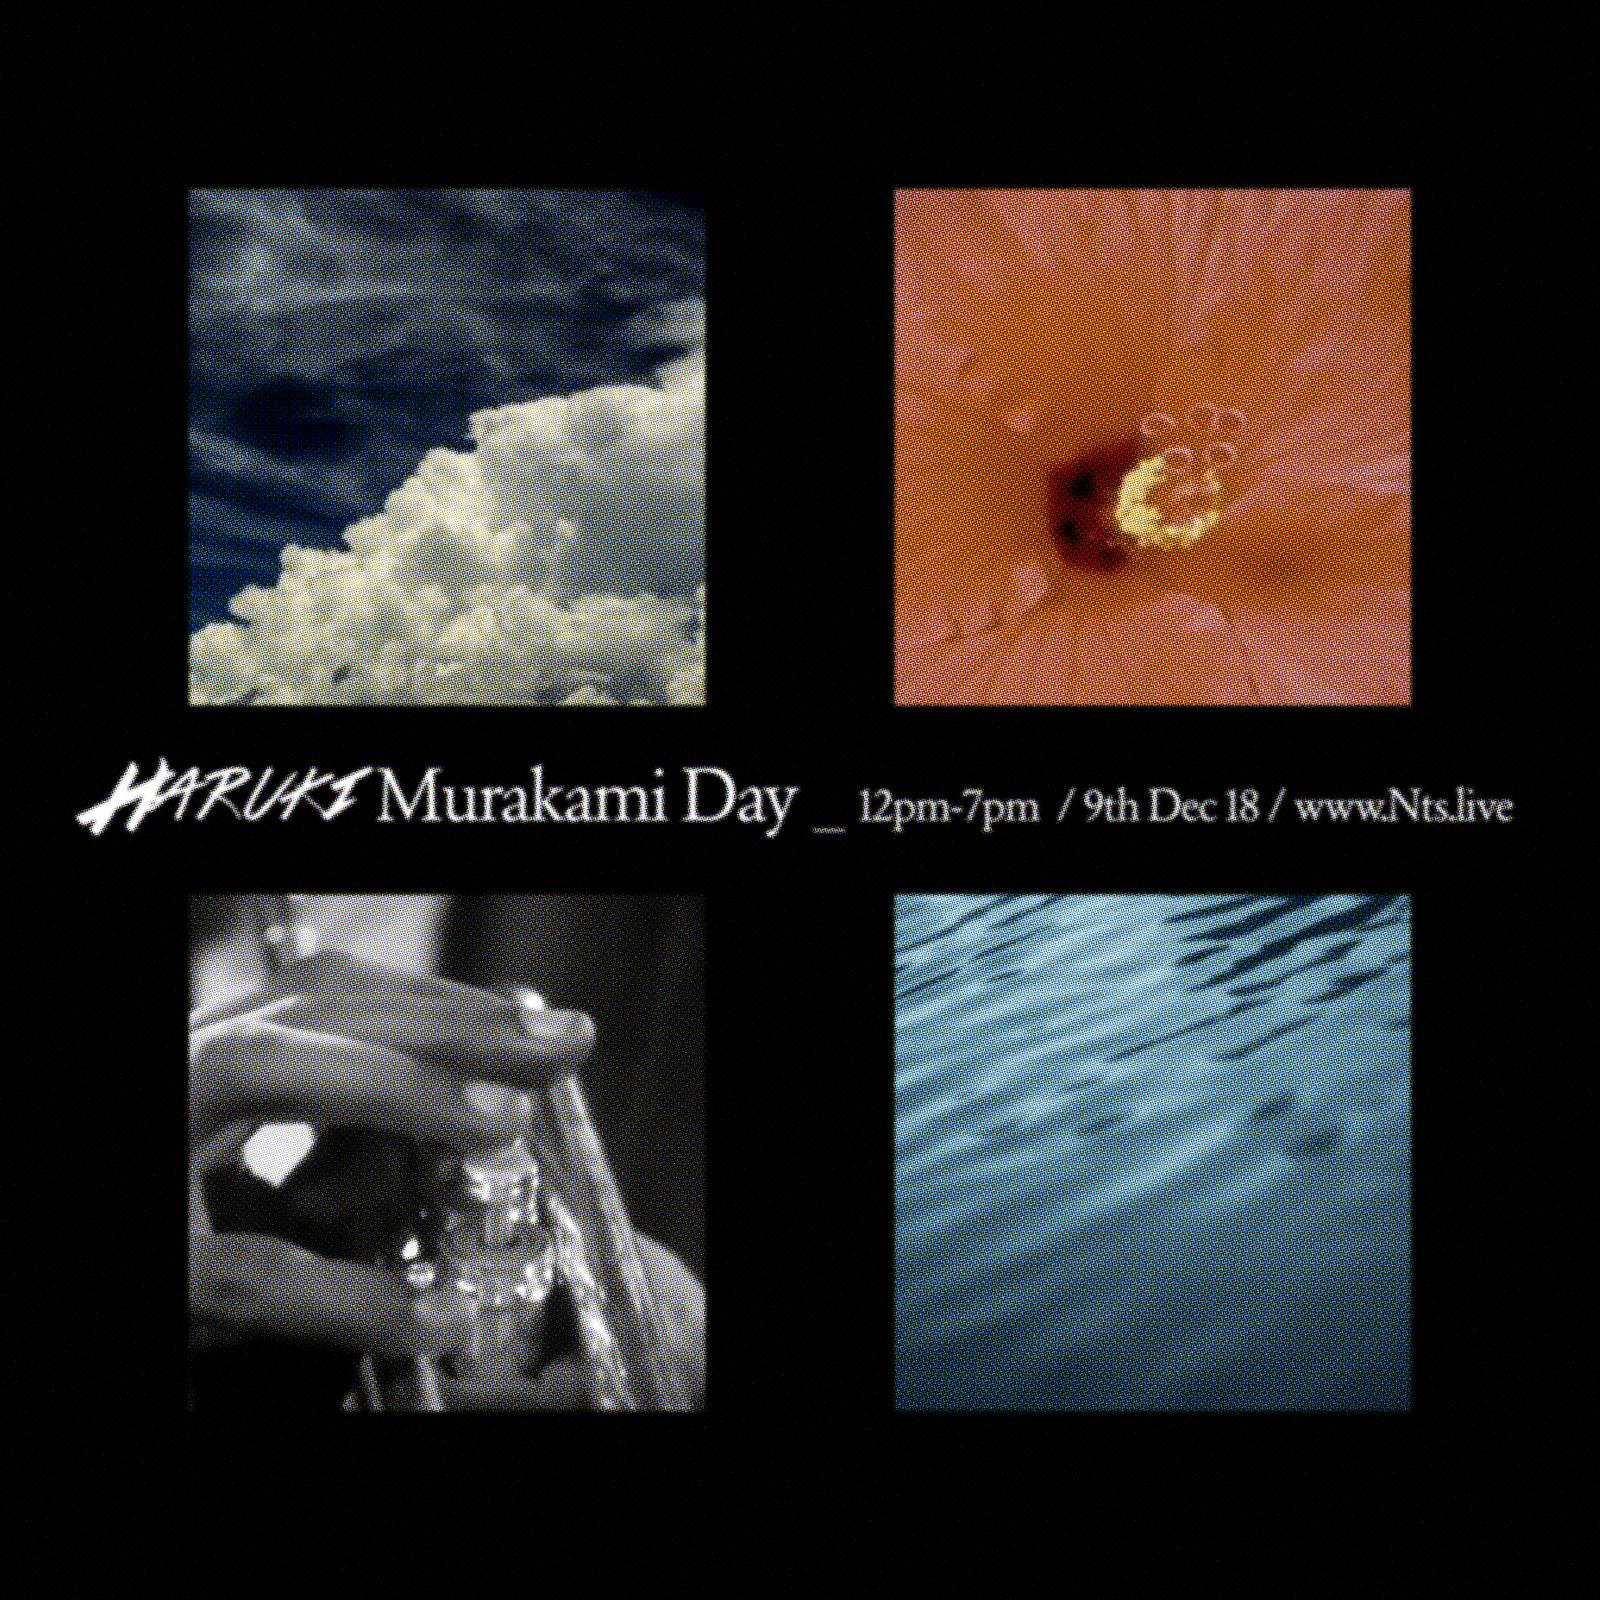 Haruki Murakami Day   NTS